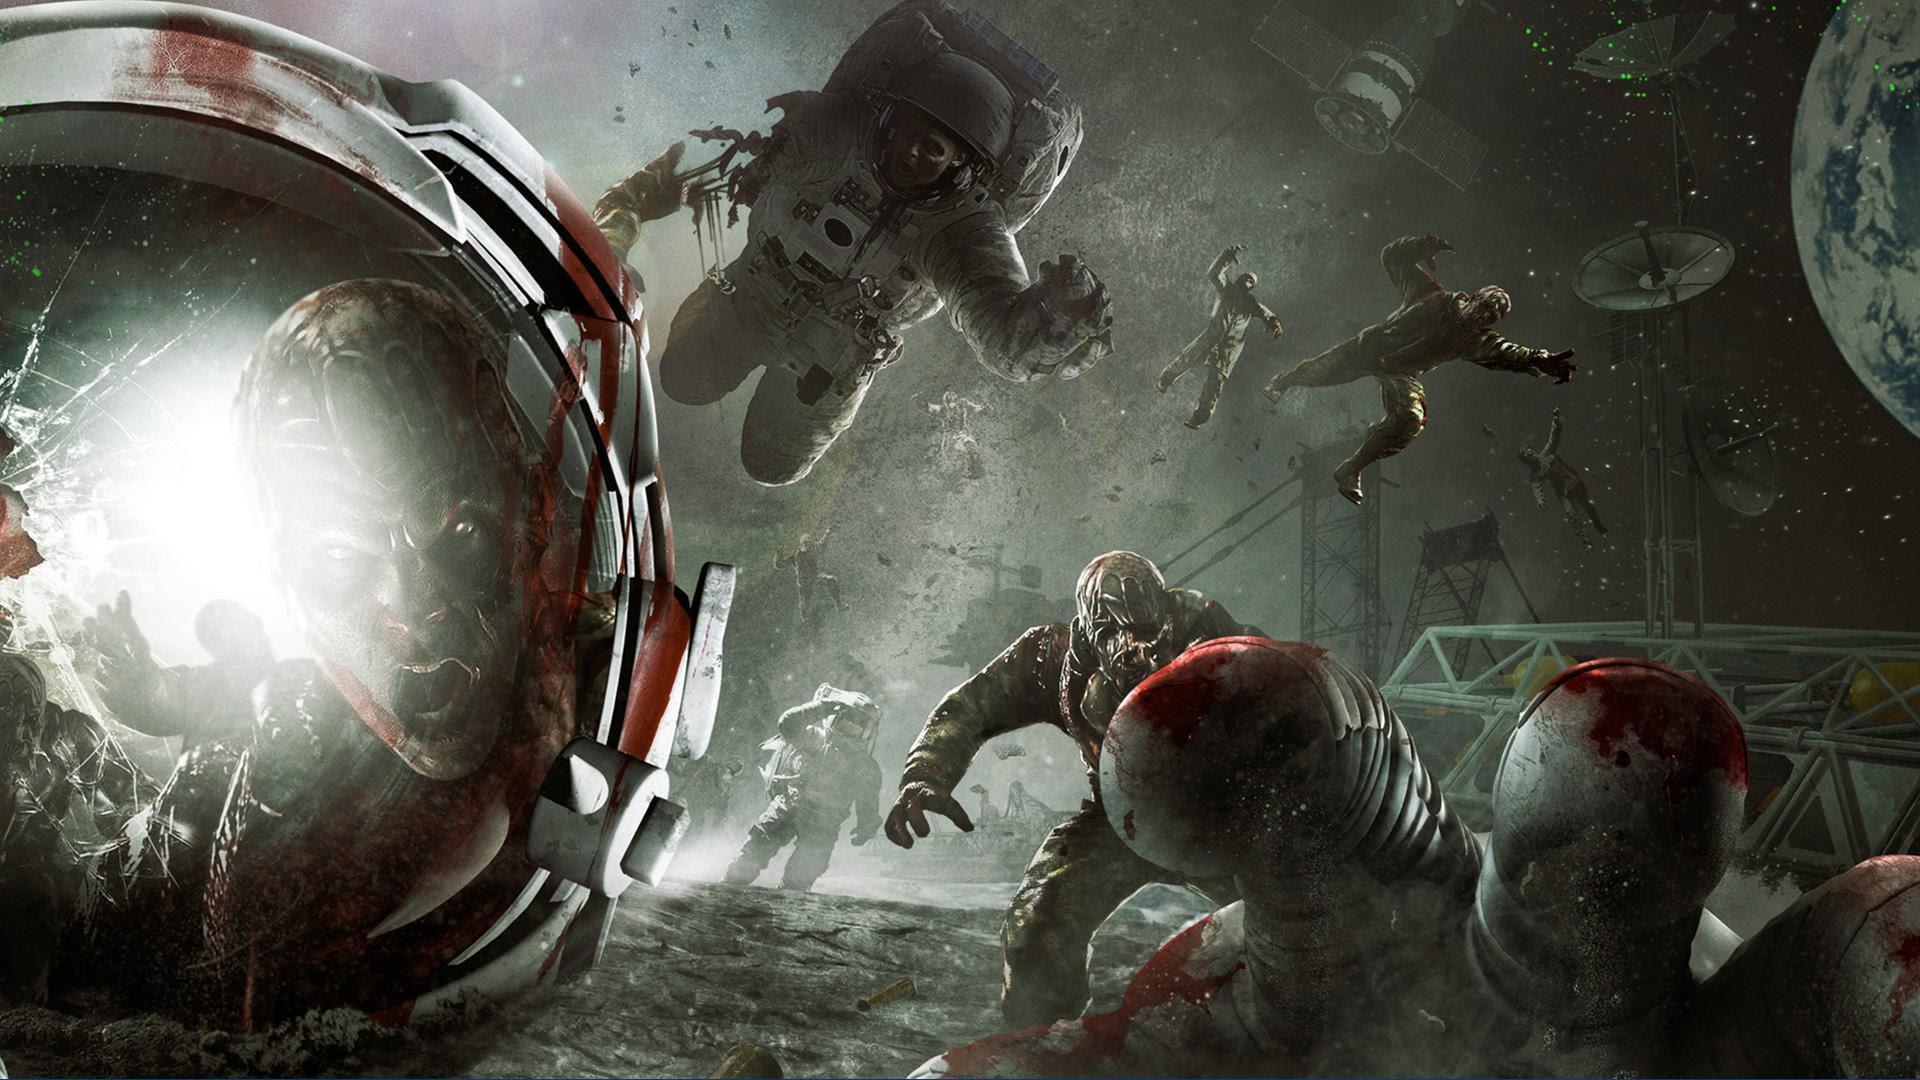 Black Ops 2 Zombies Wallpaper Sf Wallpaper